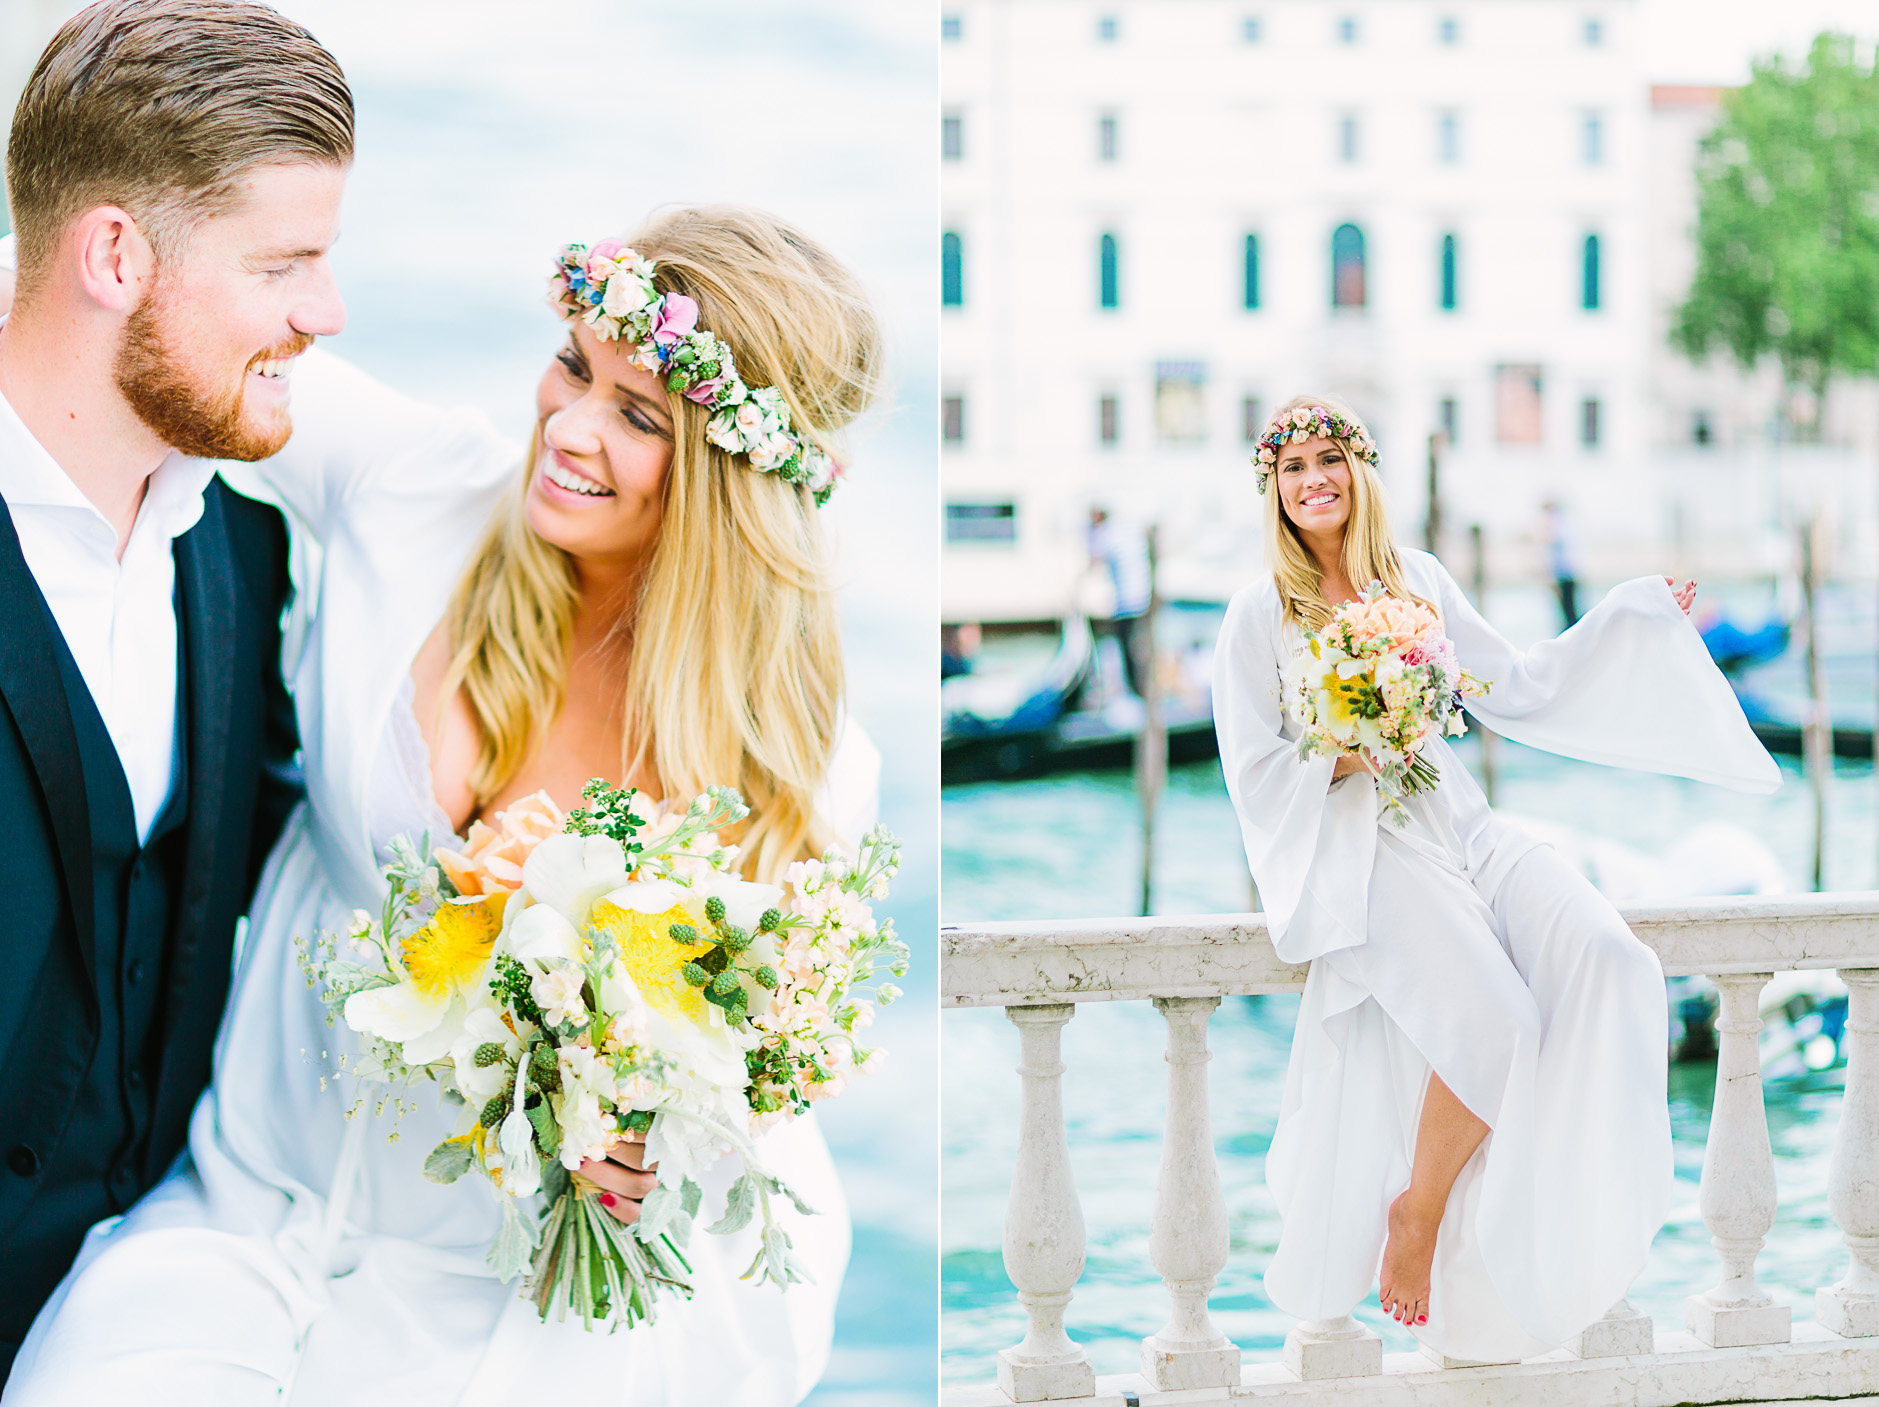 Hochzeitsfotograf Le Hai Linh Boho Chic After Wedding Shooting Venedig Timo Horn 1.FC Koeln 046.jpg